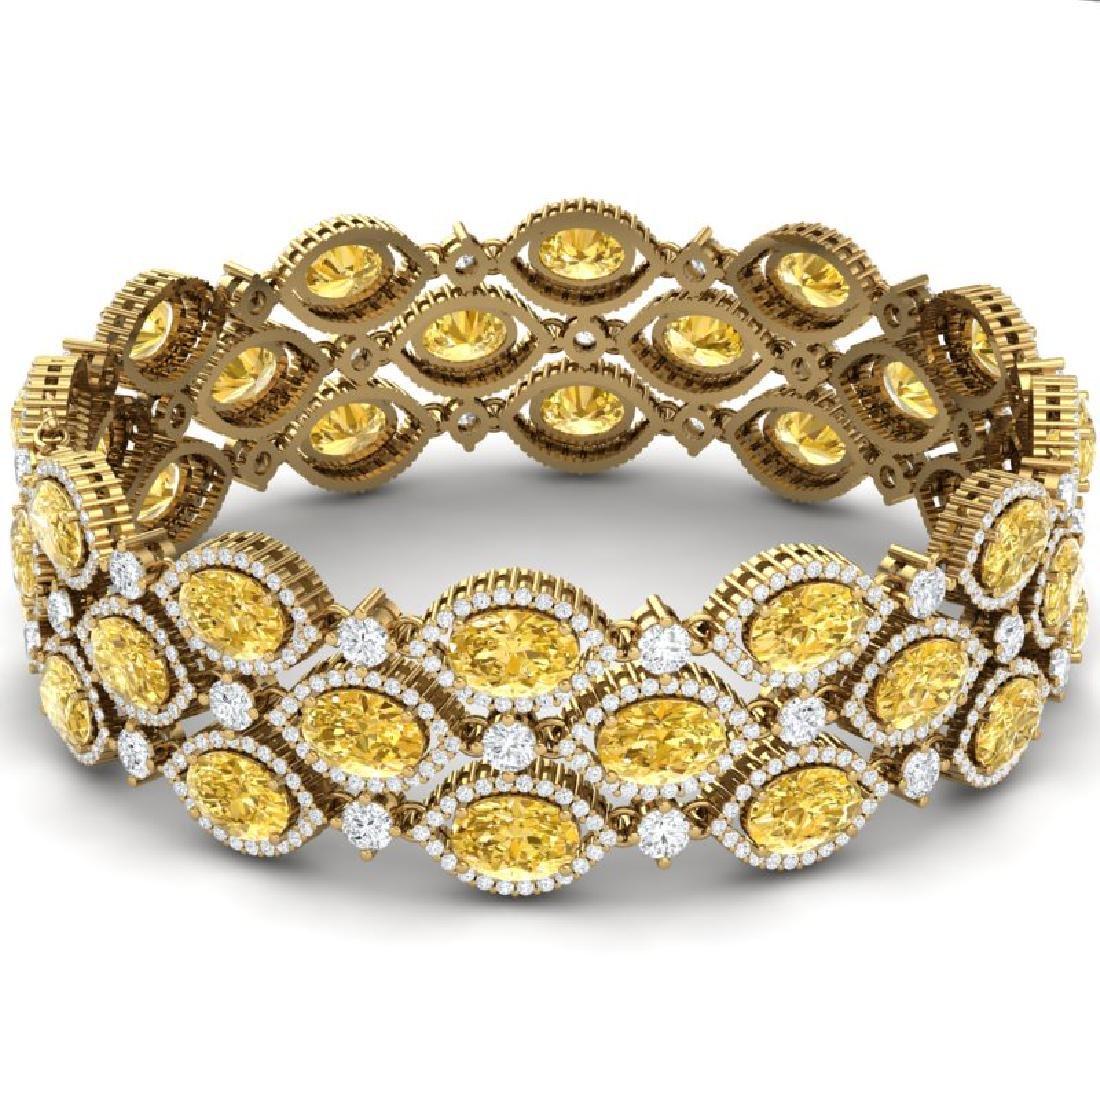 43.84 CTW Royalty Canary Citrine & VS Diamond Bracelet - 3